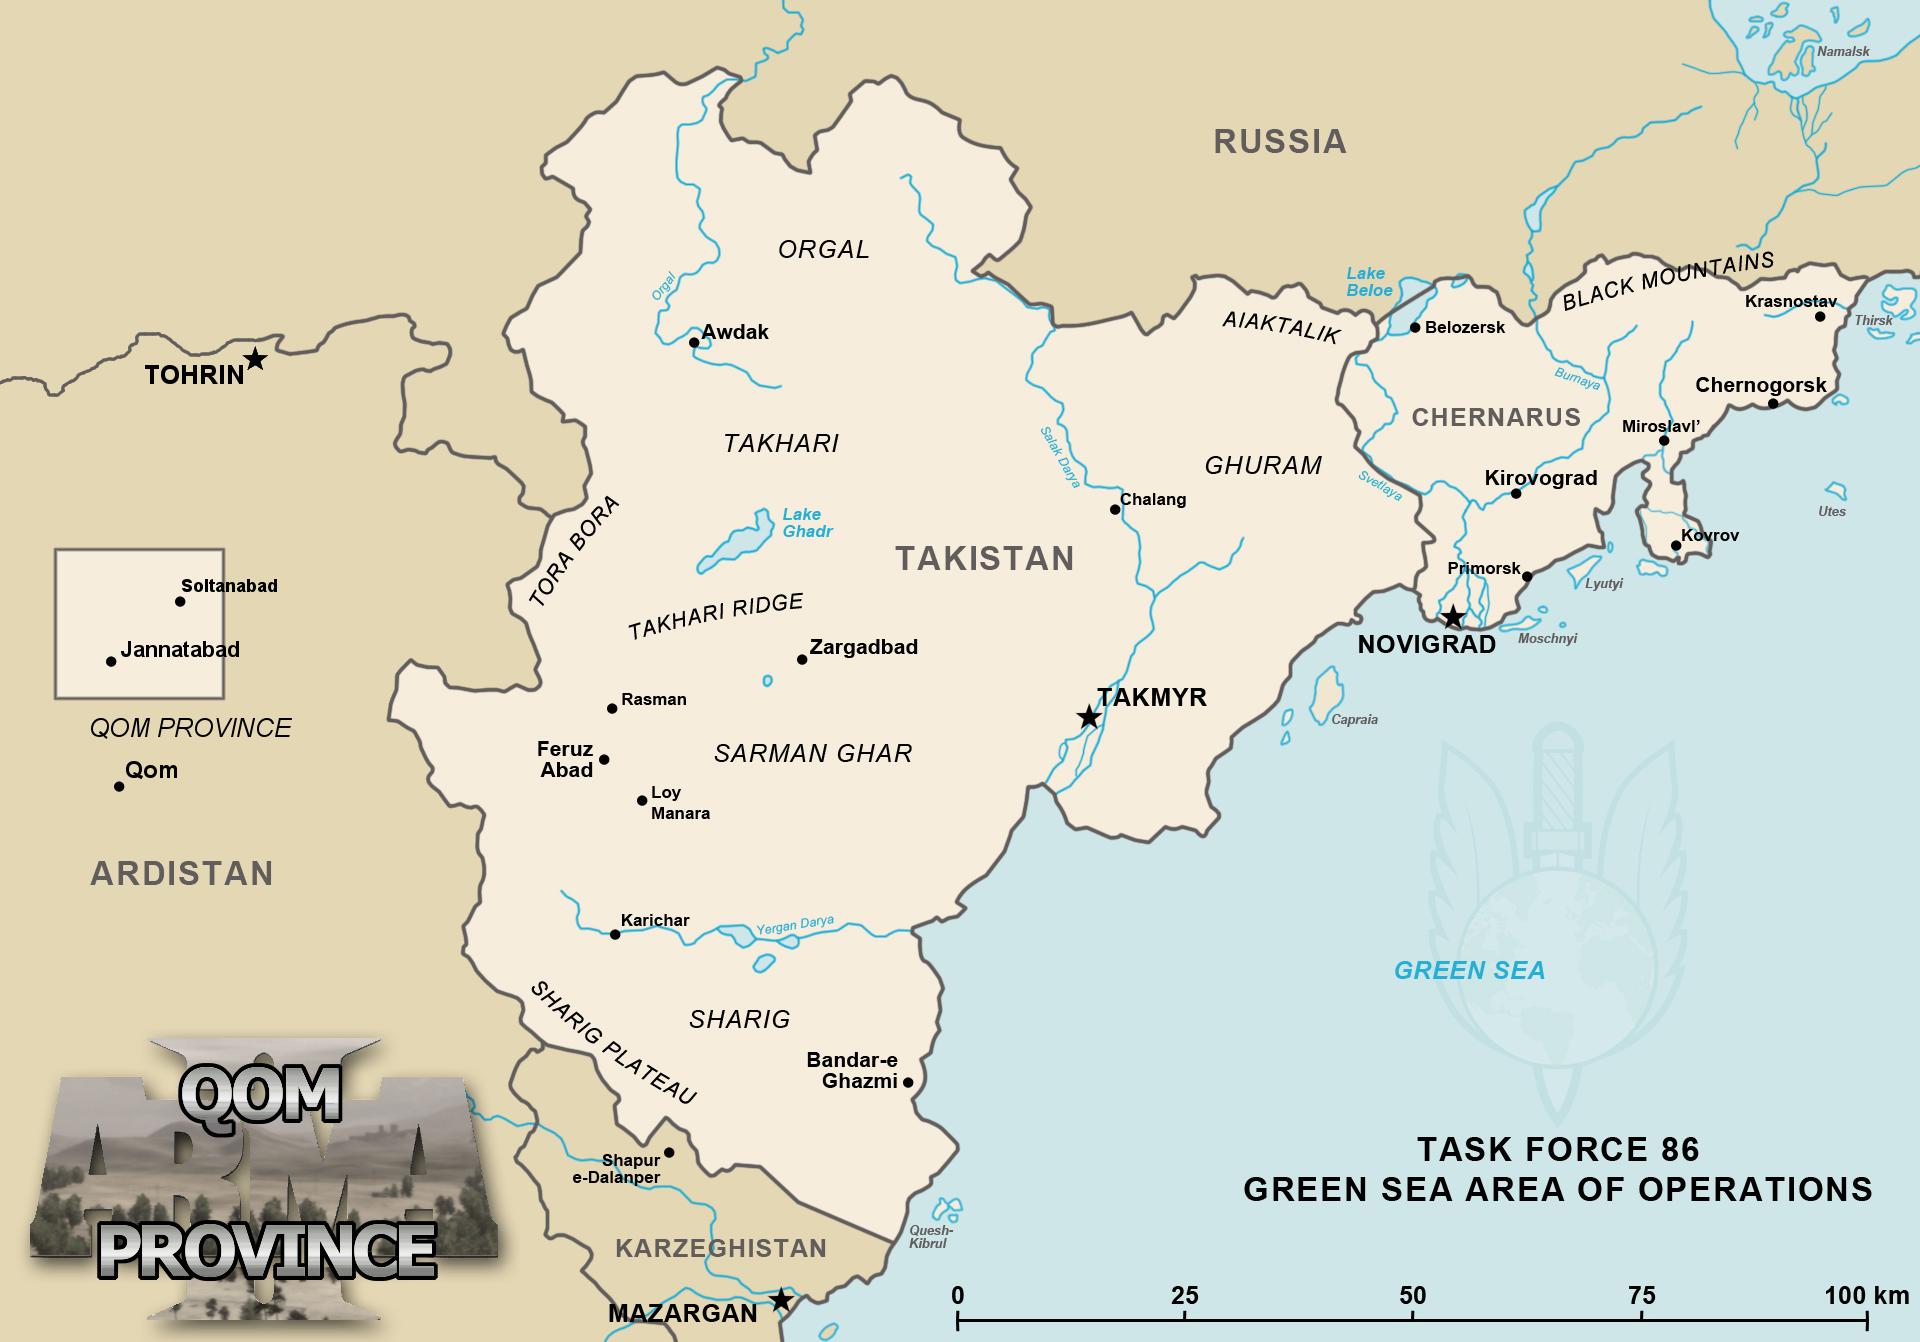 Kamenka Dayz Standalone Chernarus Map on loot map dayz standalone, map for dayz standalone, prison island map dayz standalone, full map dayz standalone, map of dayz standalone, vehicle map dayz standalone, chernarus map dayz mod,